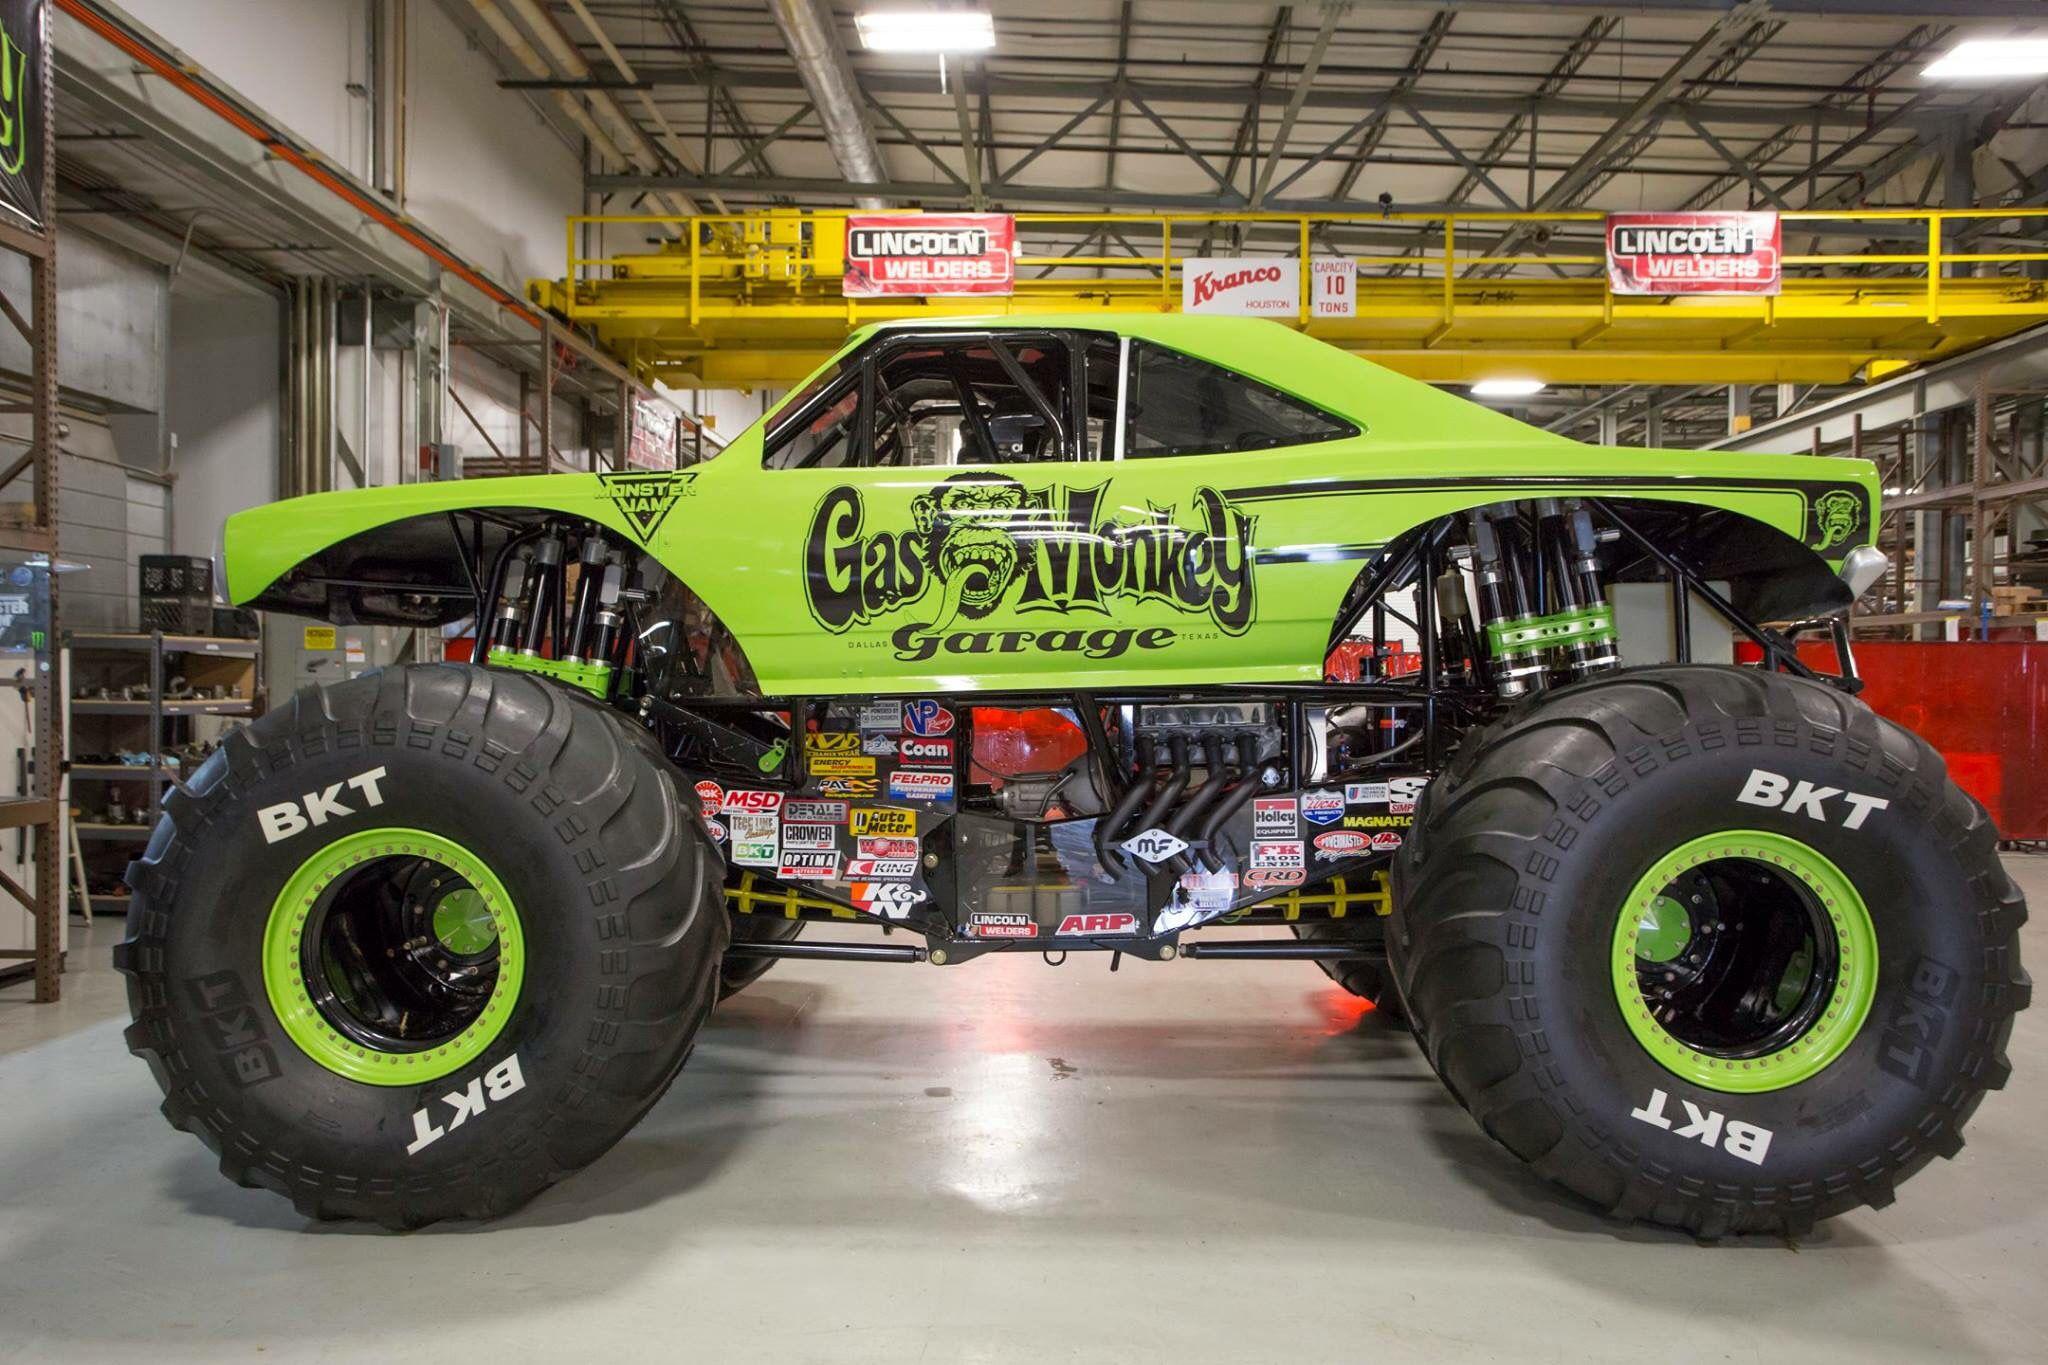 gas monkey garage monster truck commander cody race. Black Bedroom Furniture Sets. Home Design Ideas